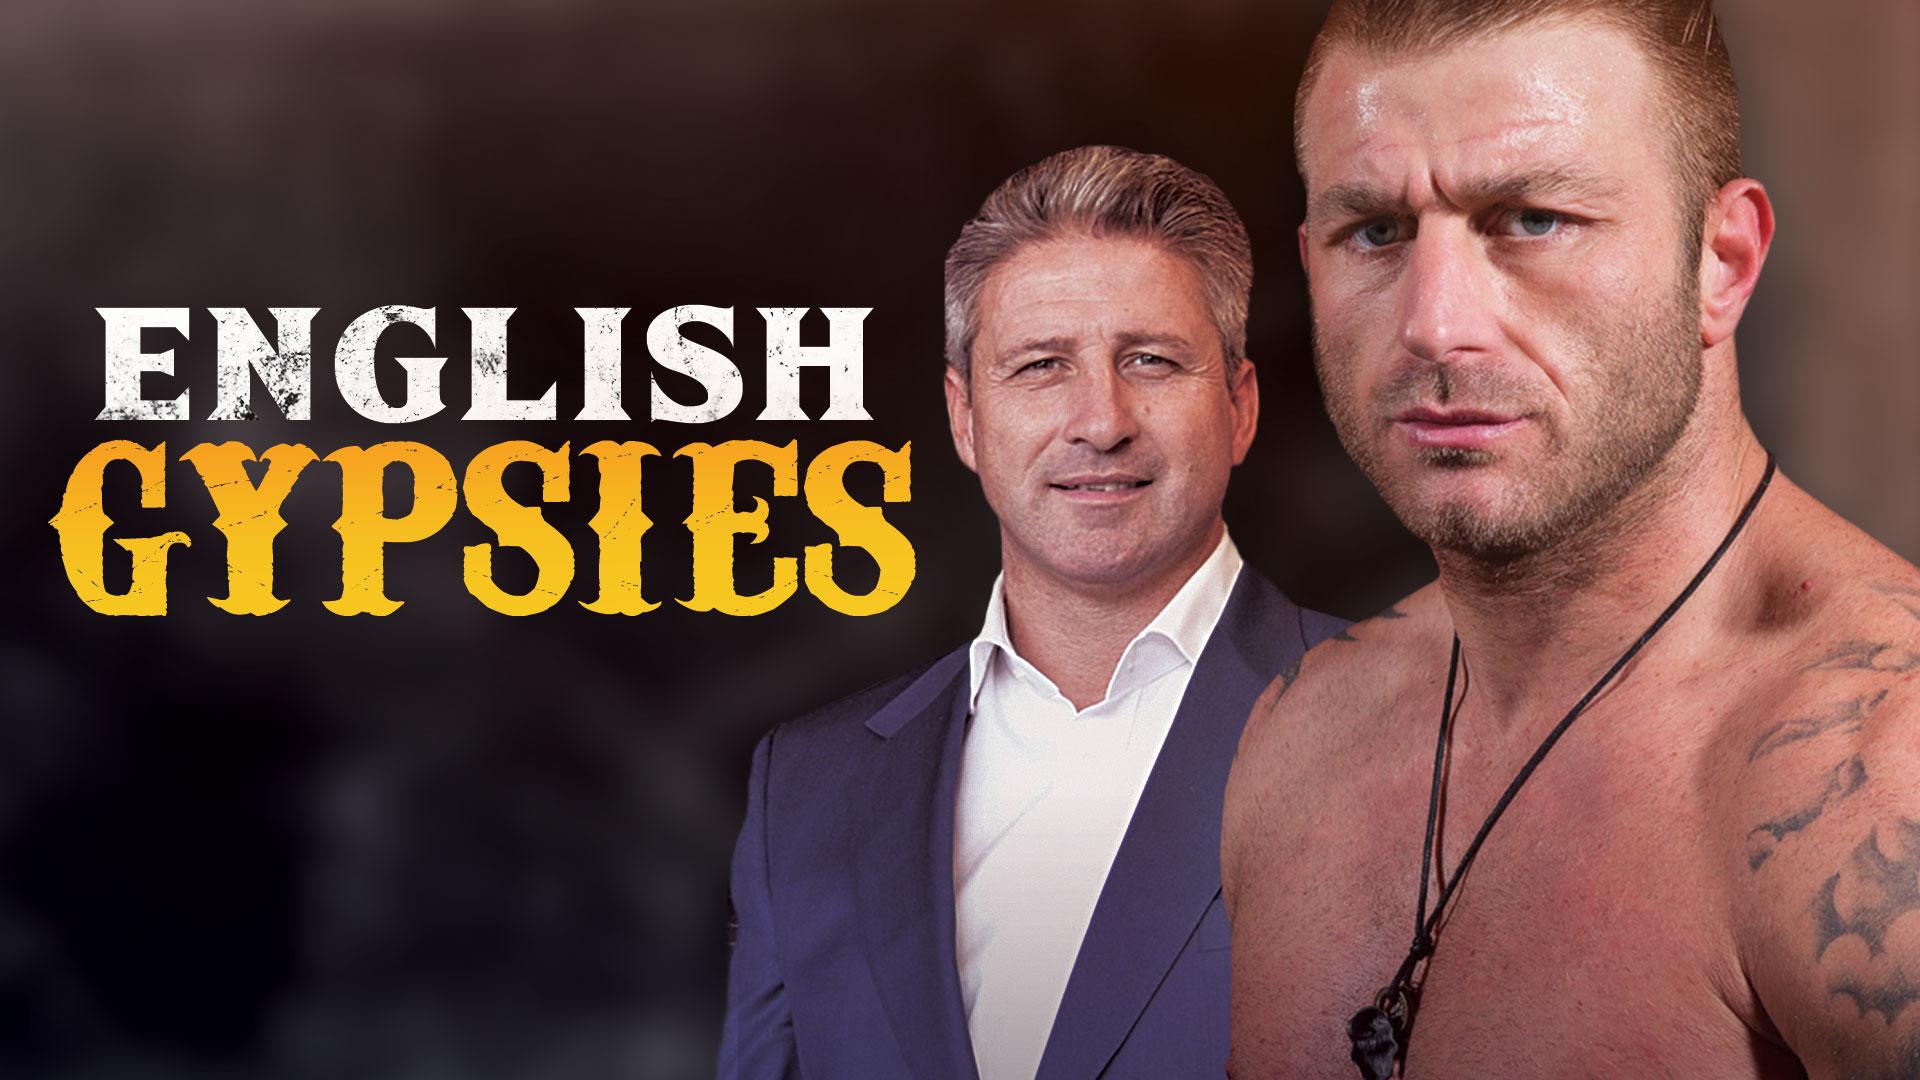 English Gypsies